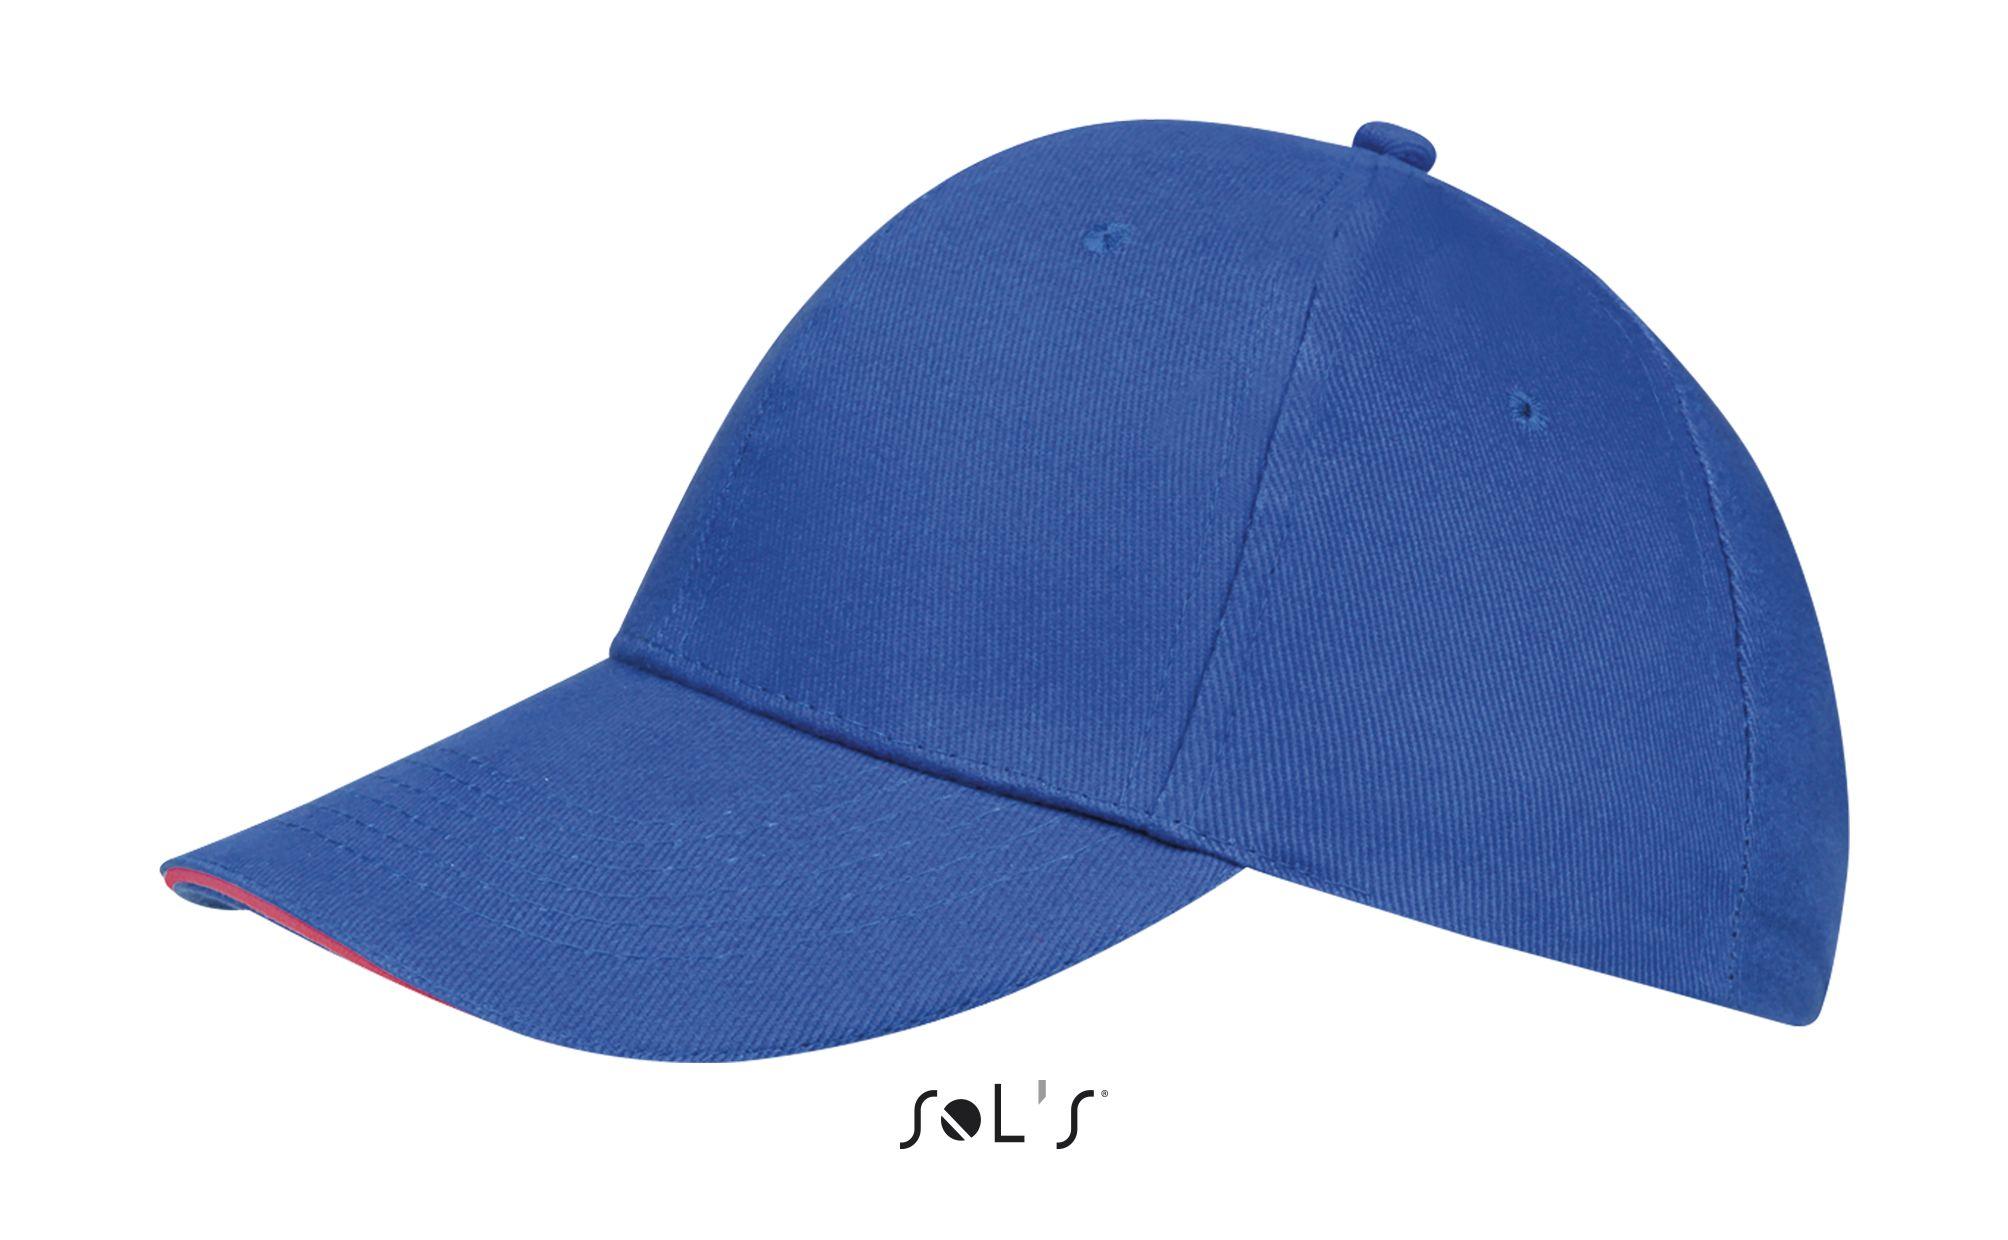 529 - Royal blue / Neon coral